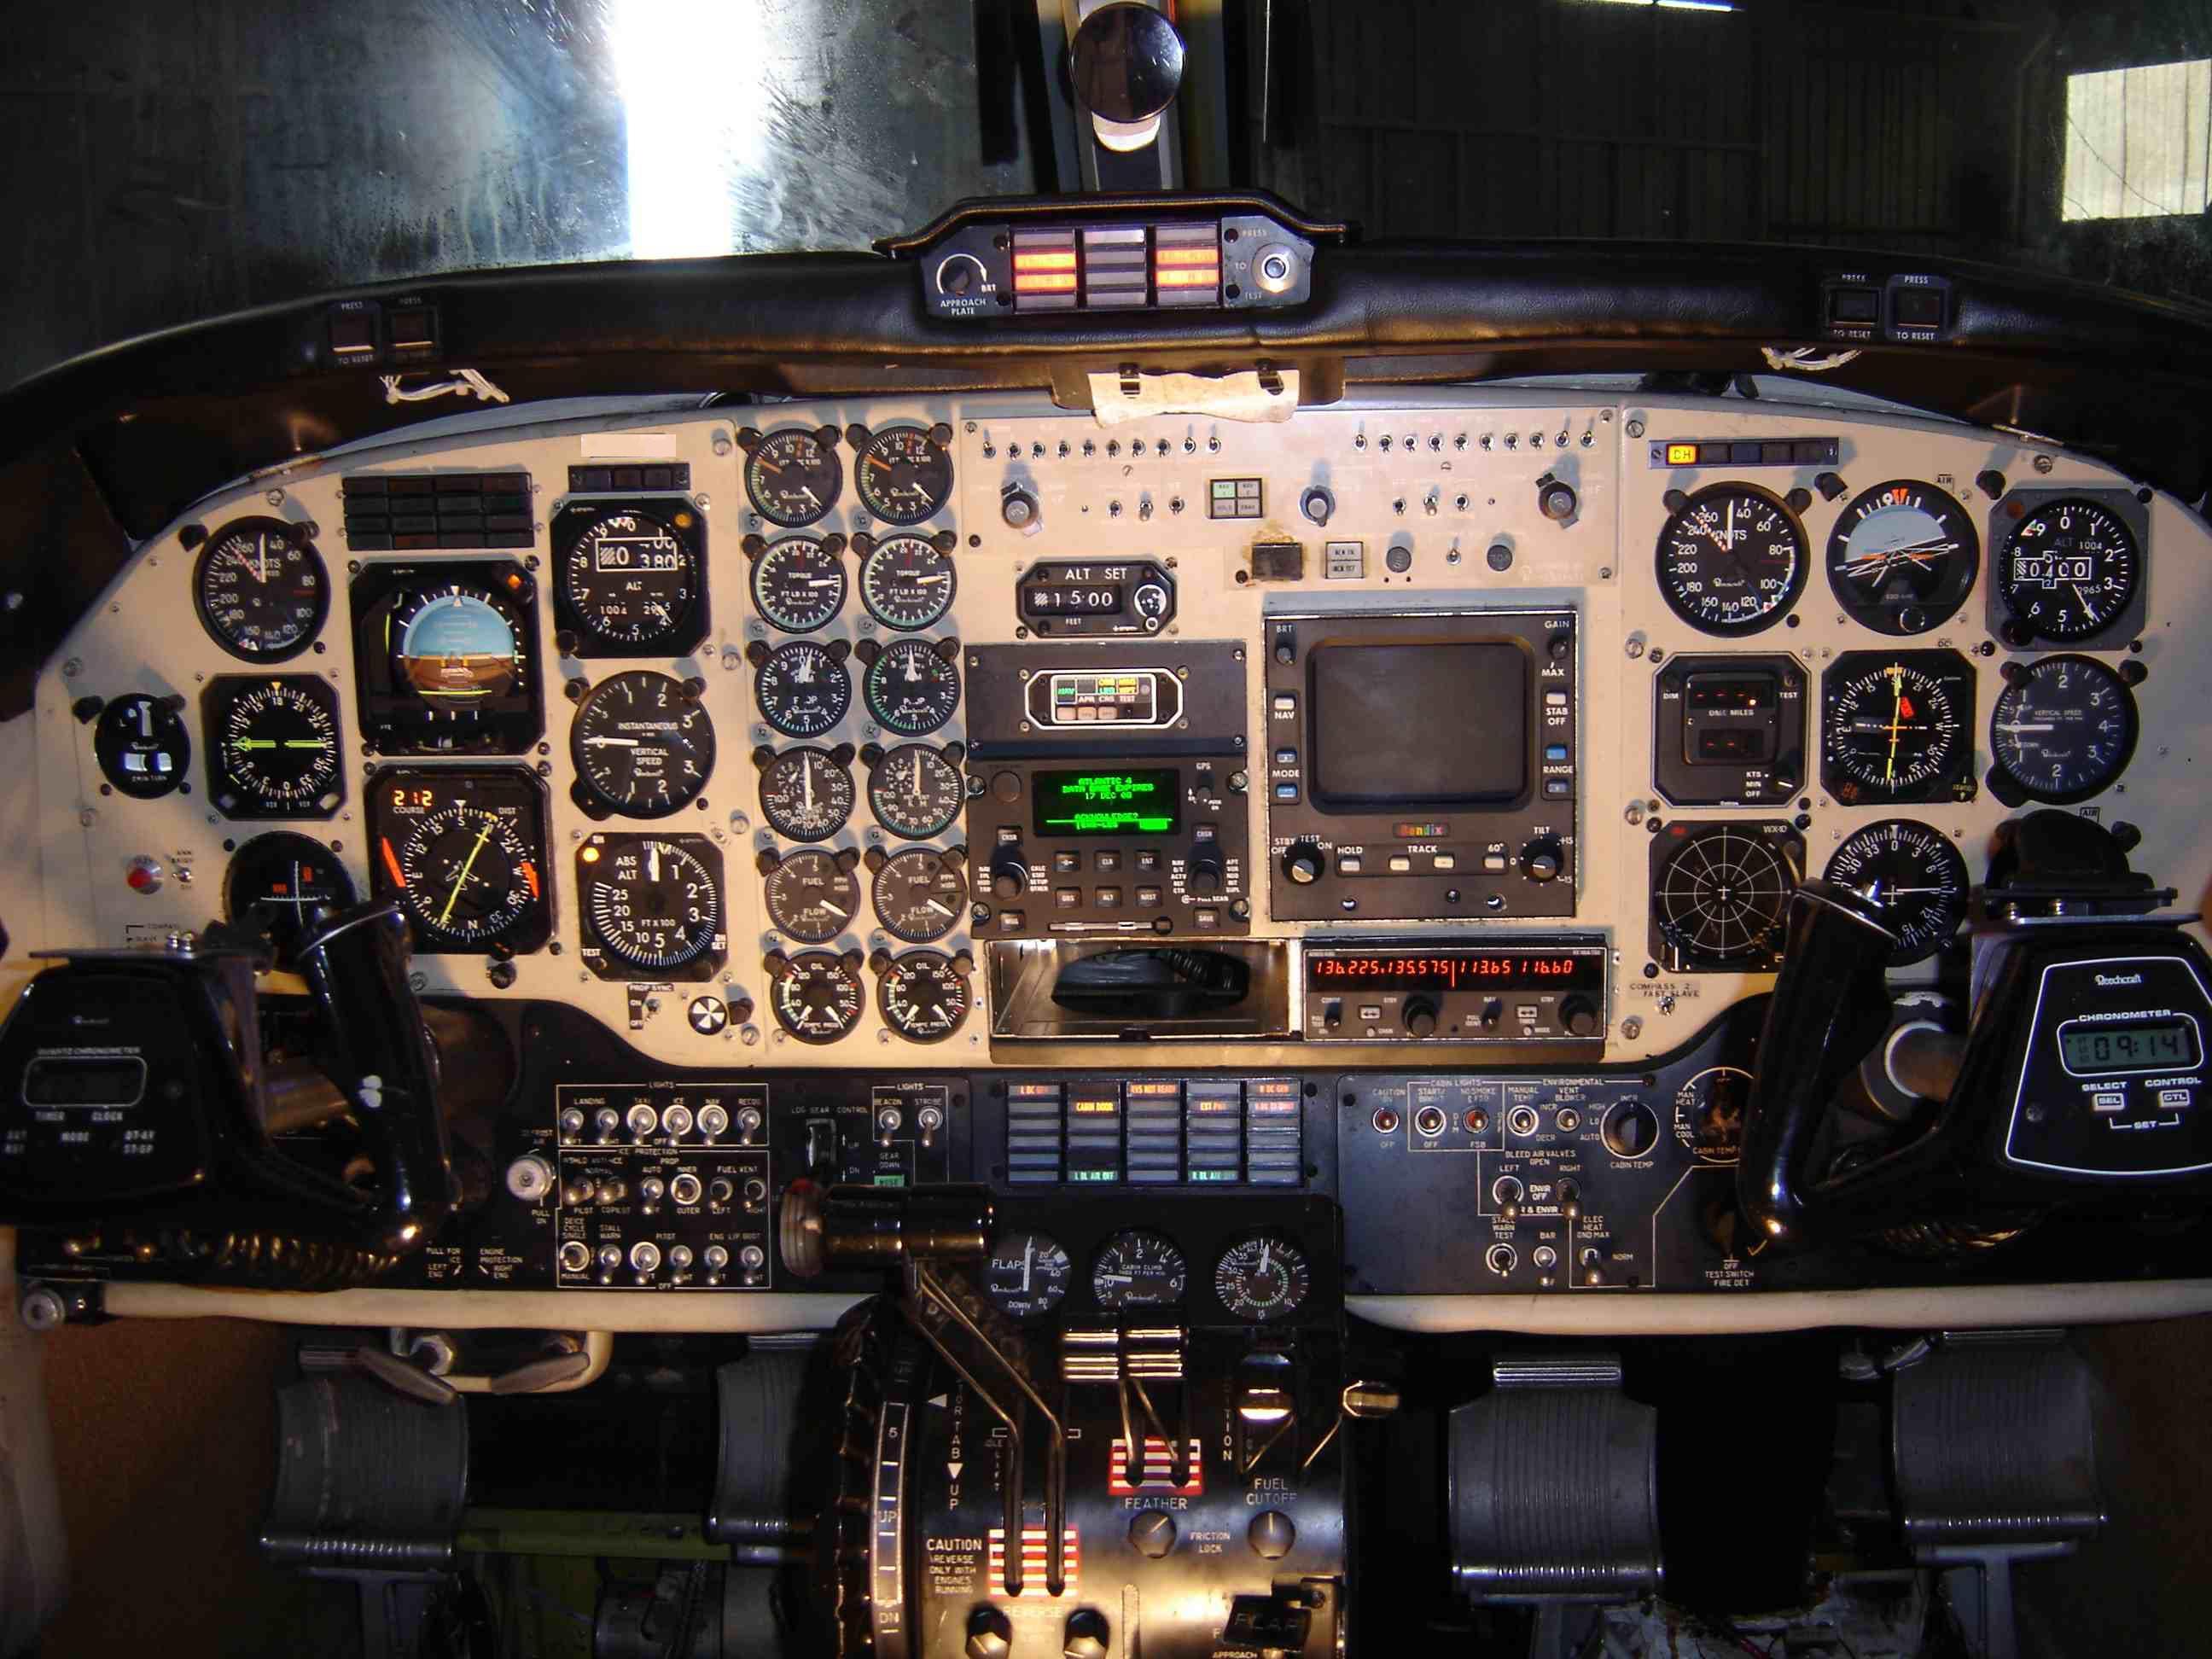 Installation Avionique Avionic